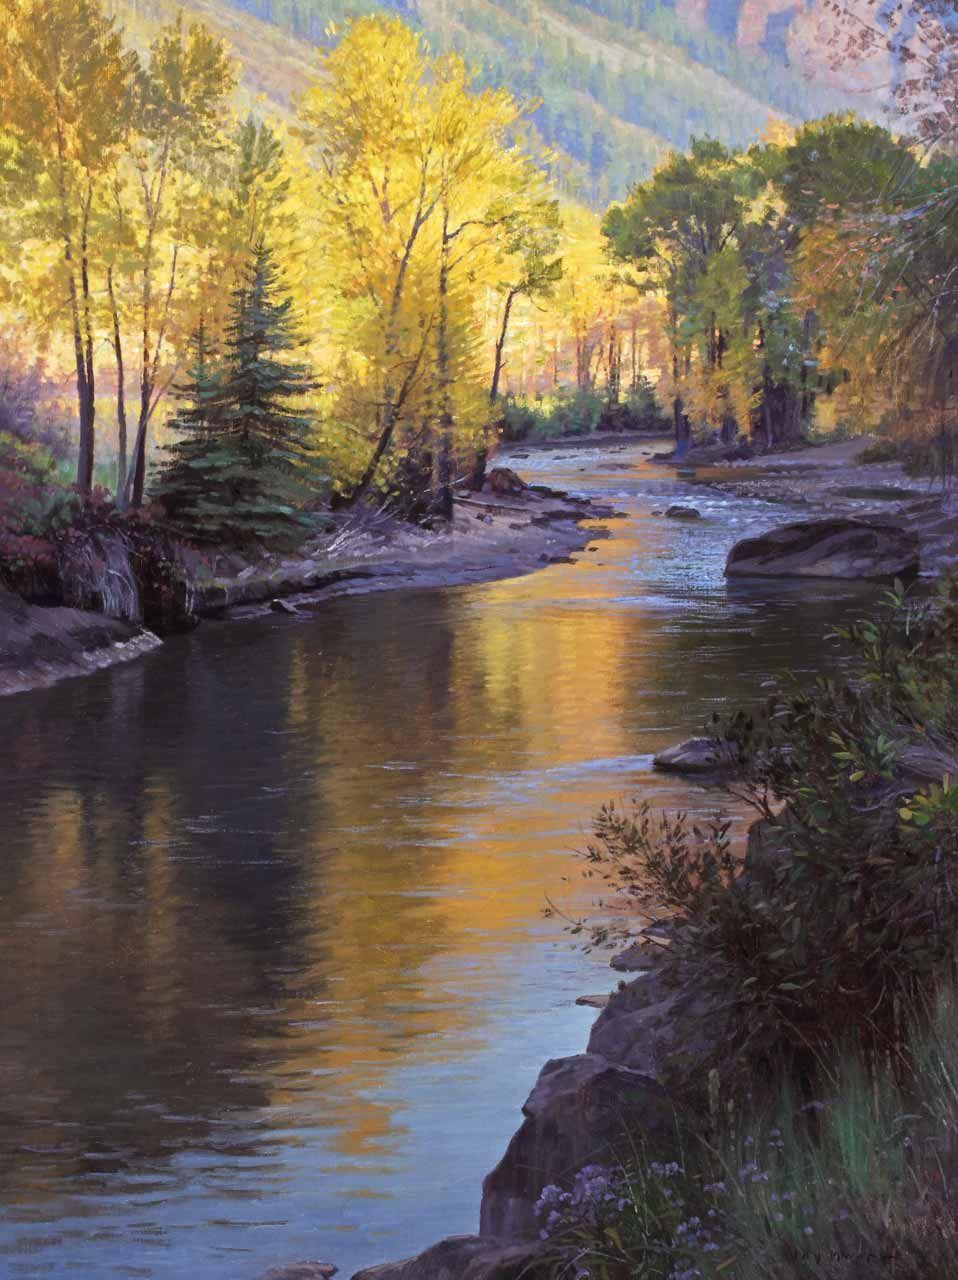 Echoes Of Light Colorado River Landscape Painting Jay Moore Studio Landscape Paintings Landscape Art River Painting